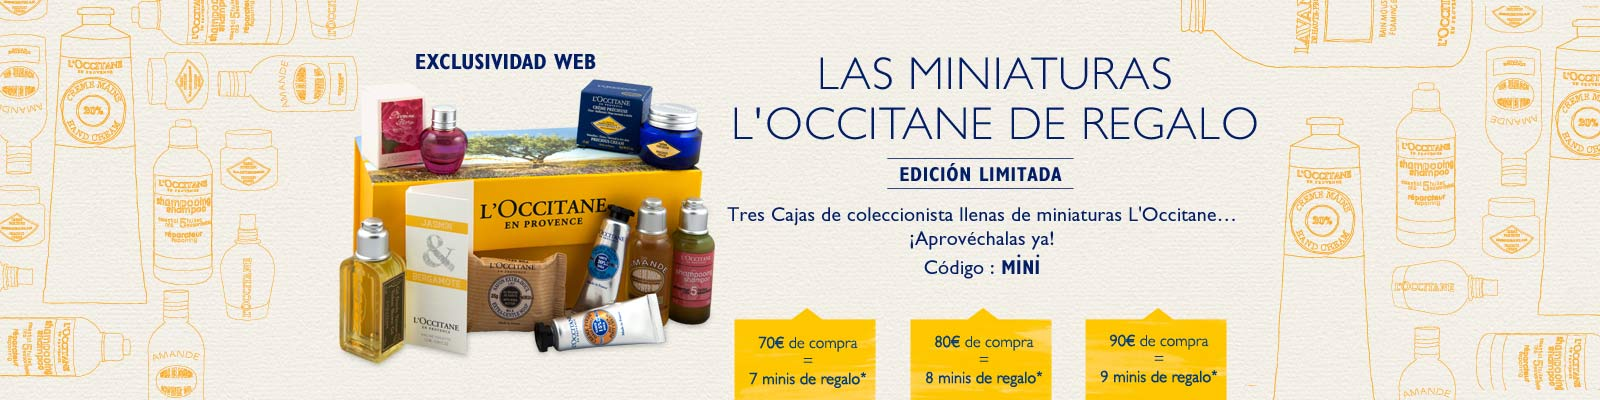 Offre miniature - L'Occitane France